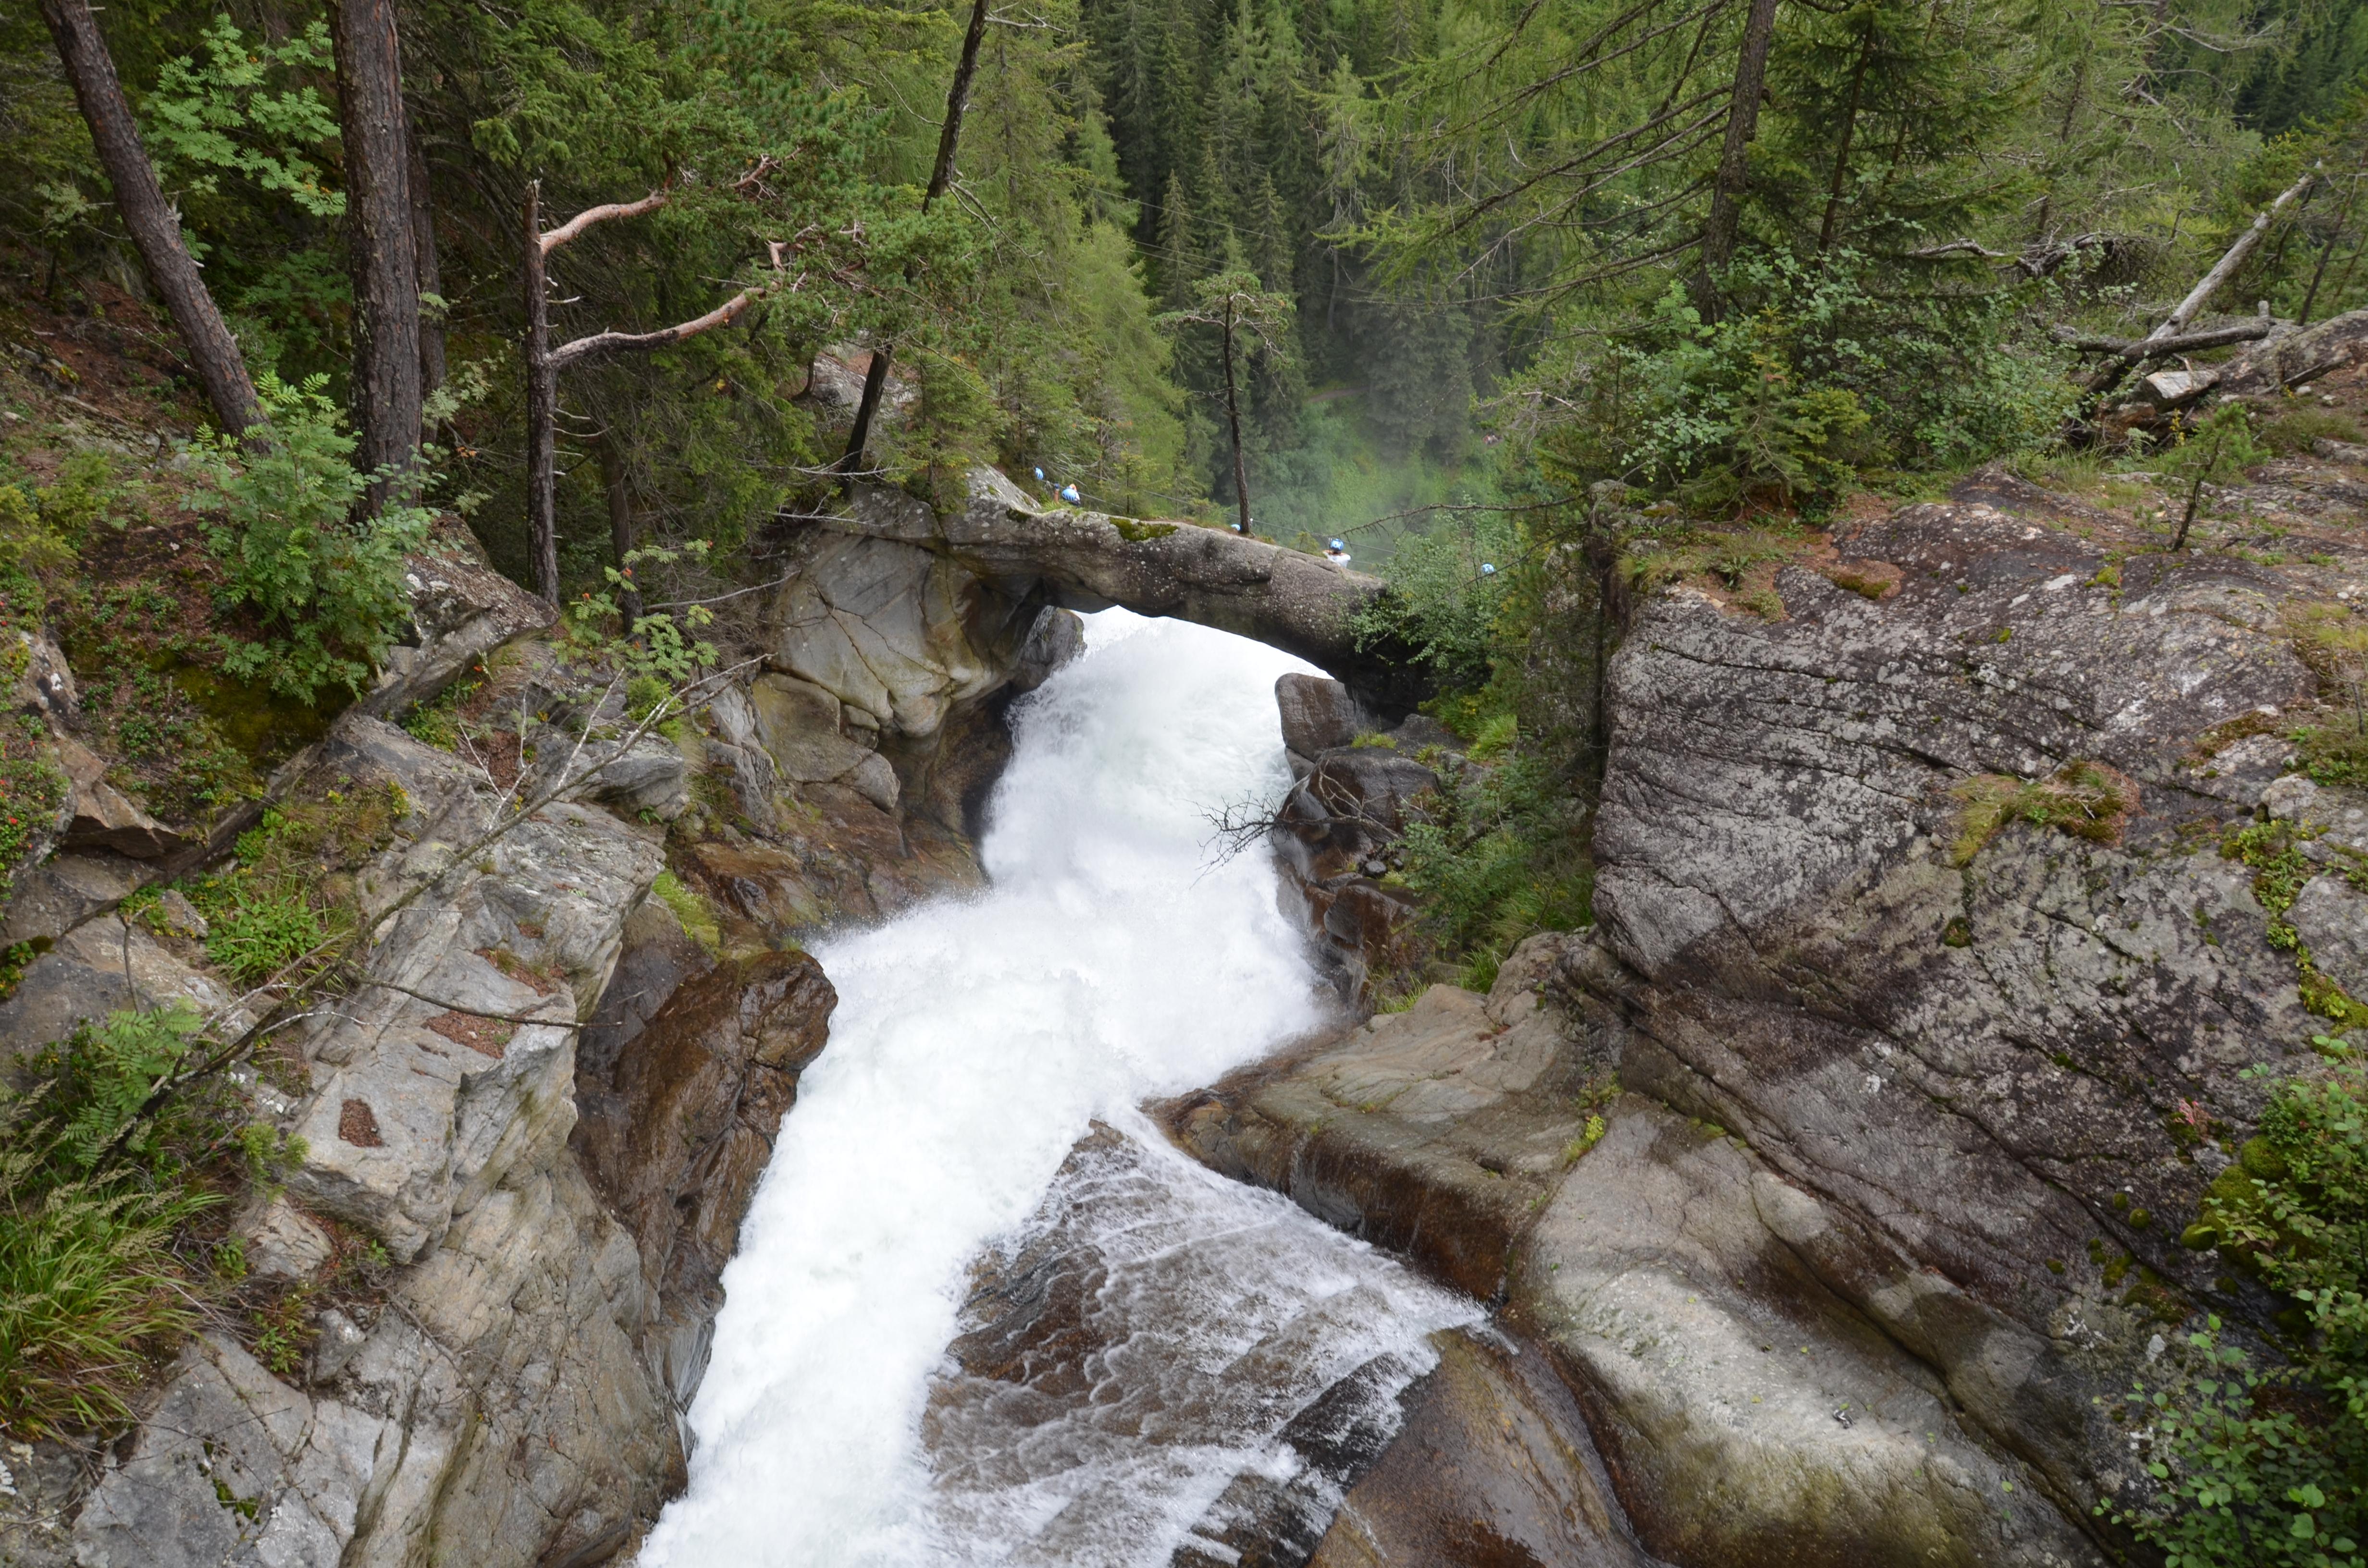 File:Stuibenfall Tirol011.JPG - Wikimedia Commons